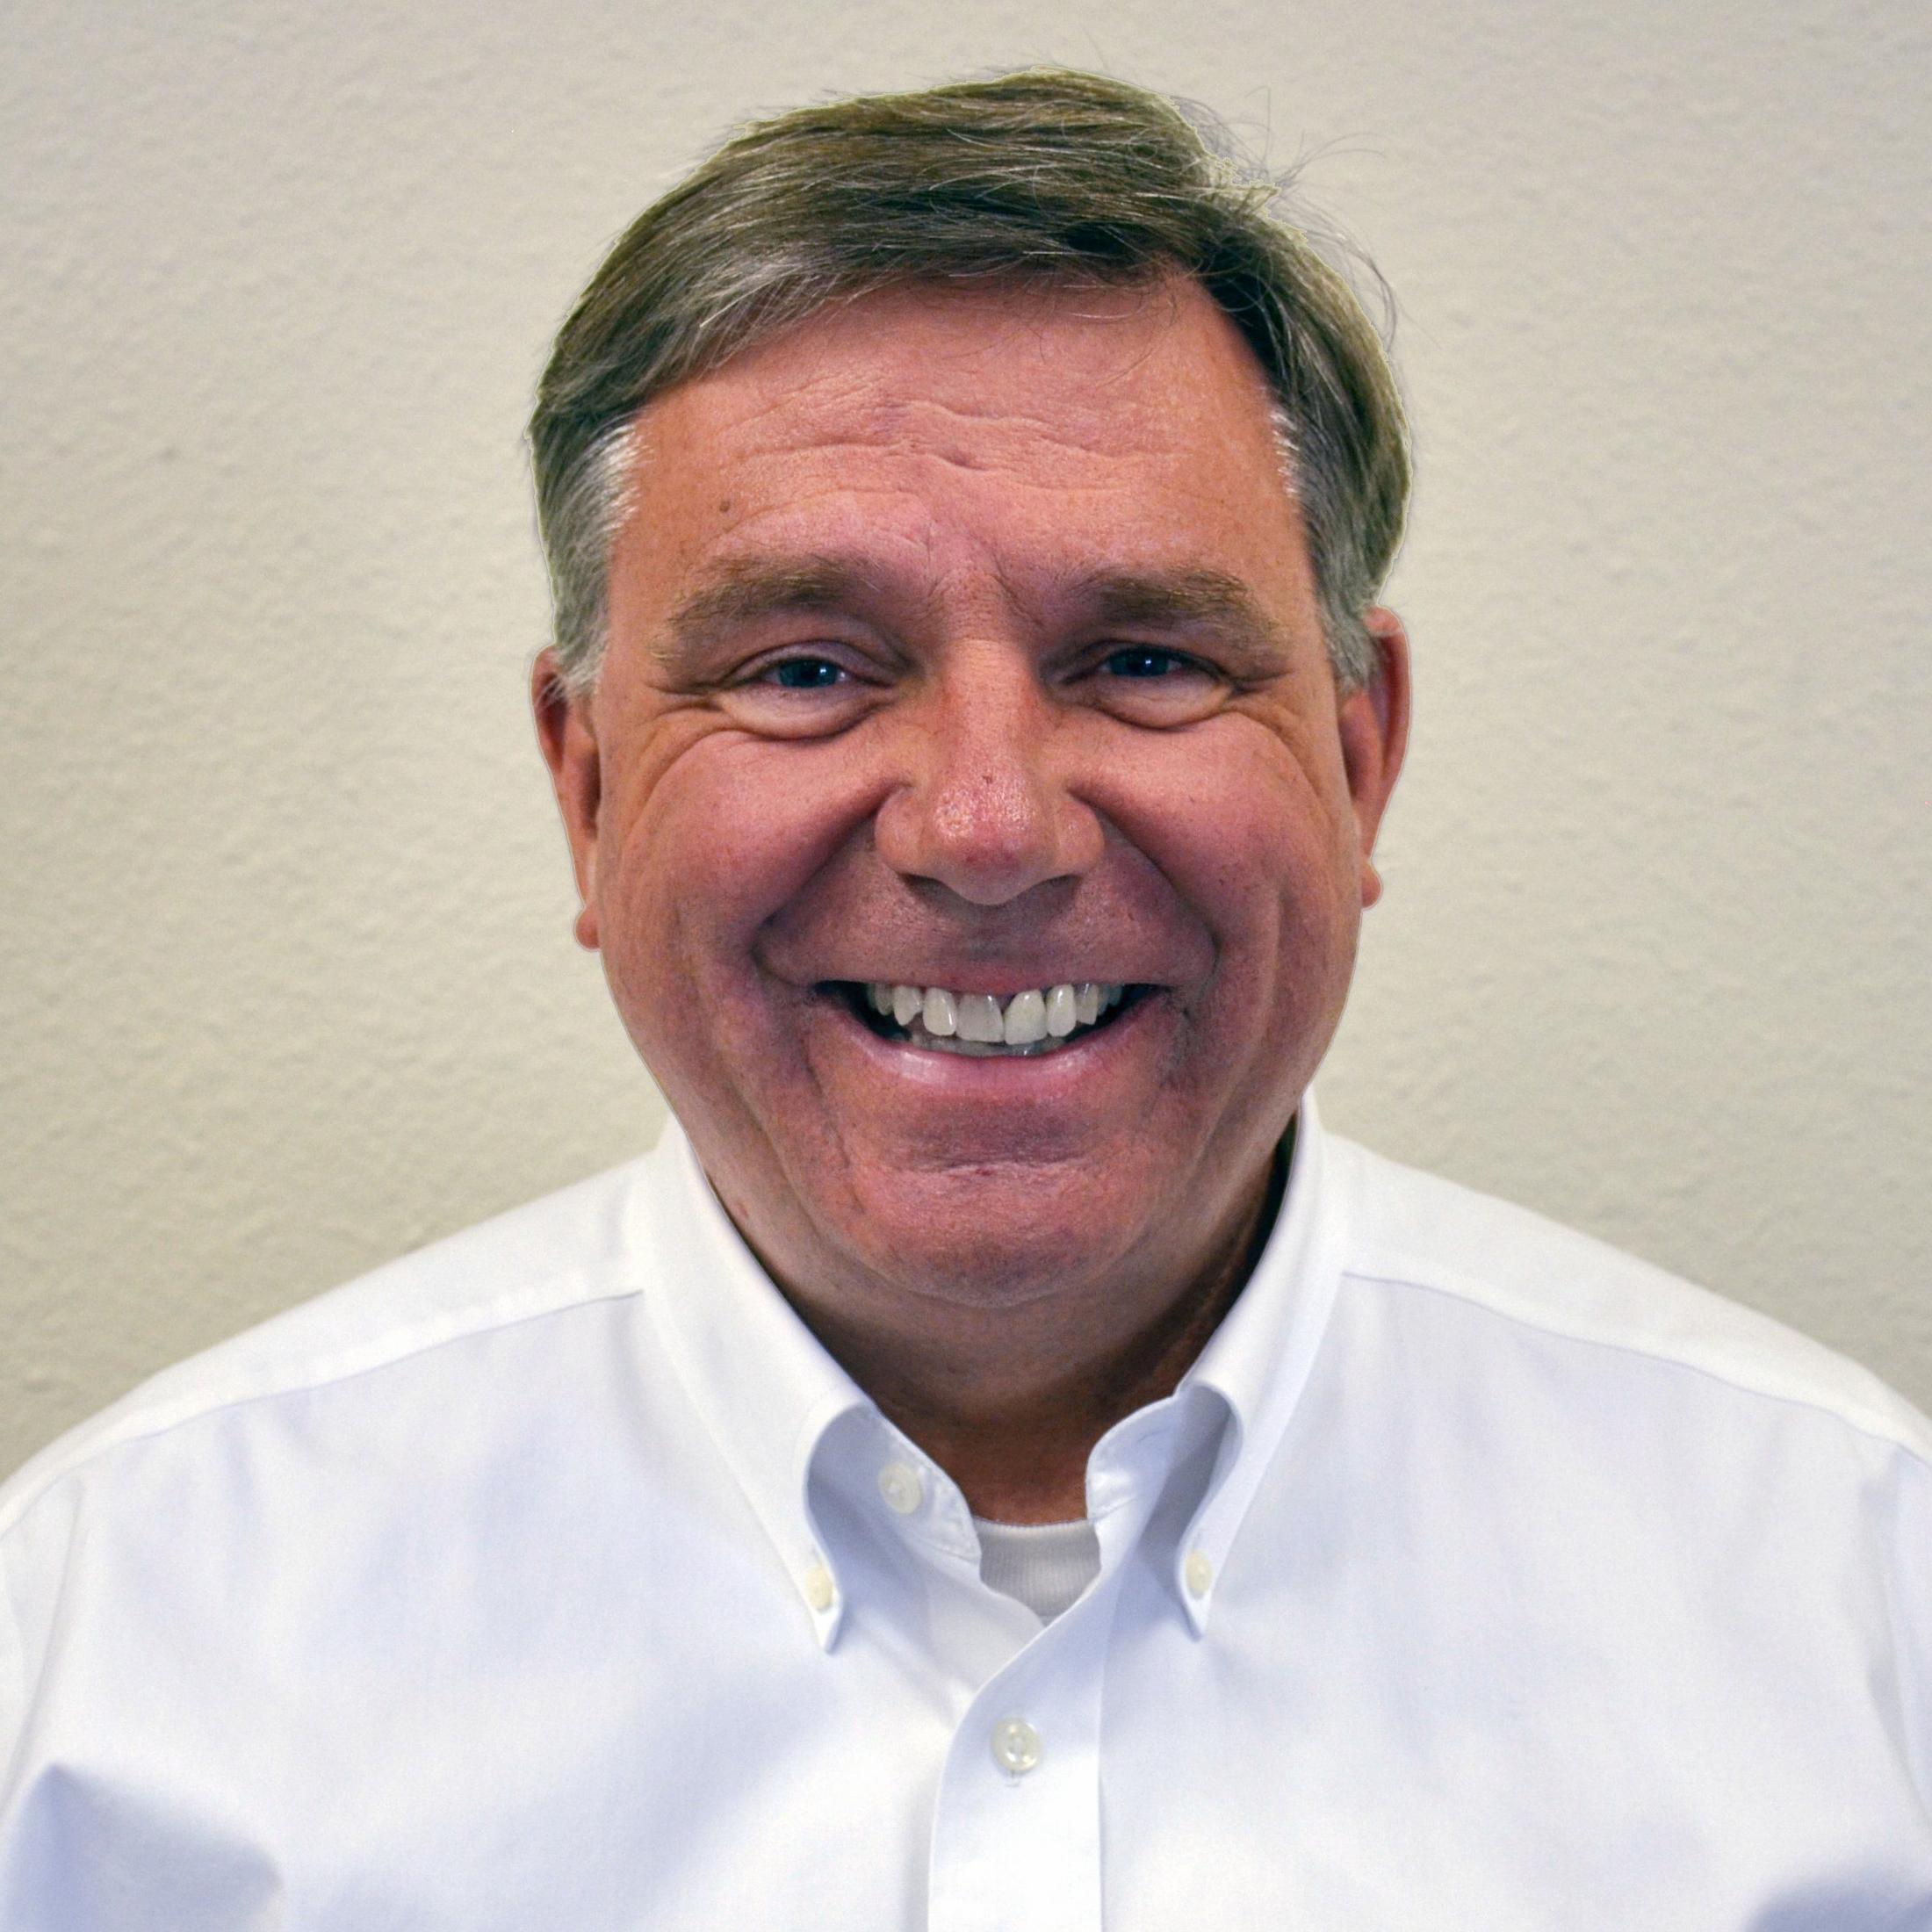 JOE L RIRIE, PE  Senior Principal Engineer AND PRESIDENT